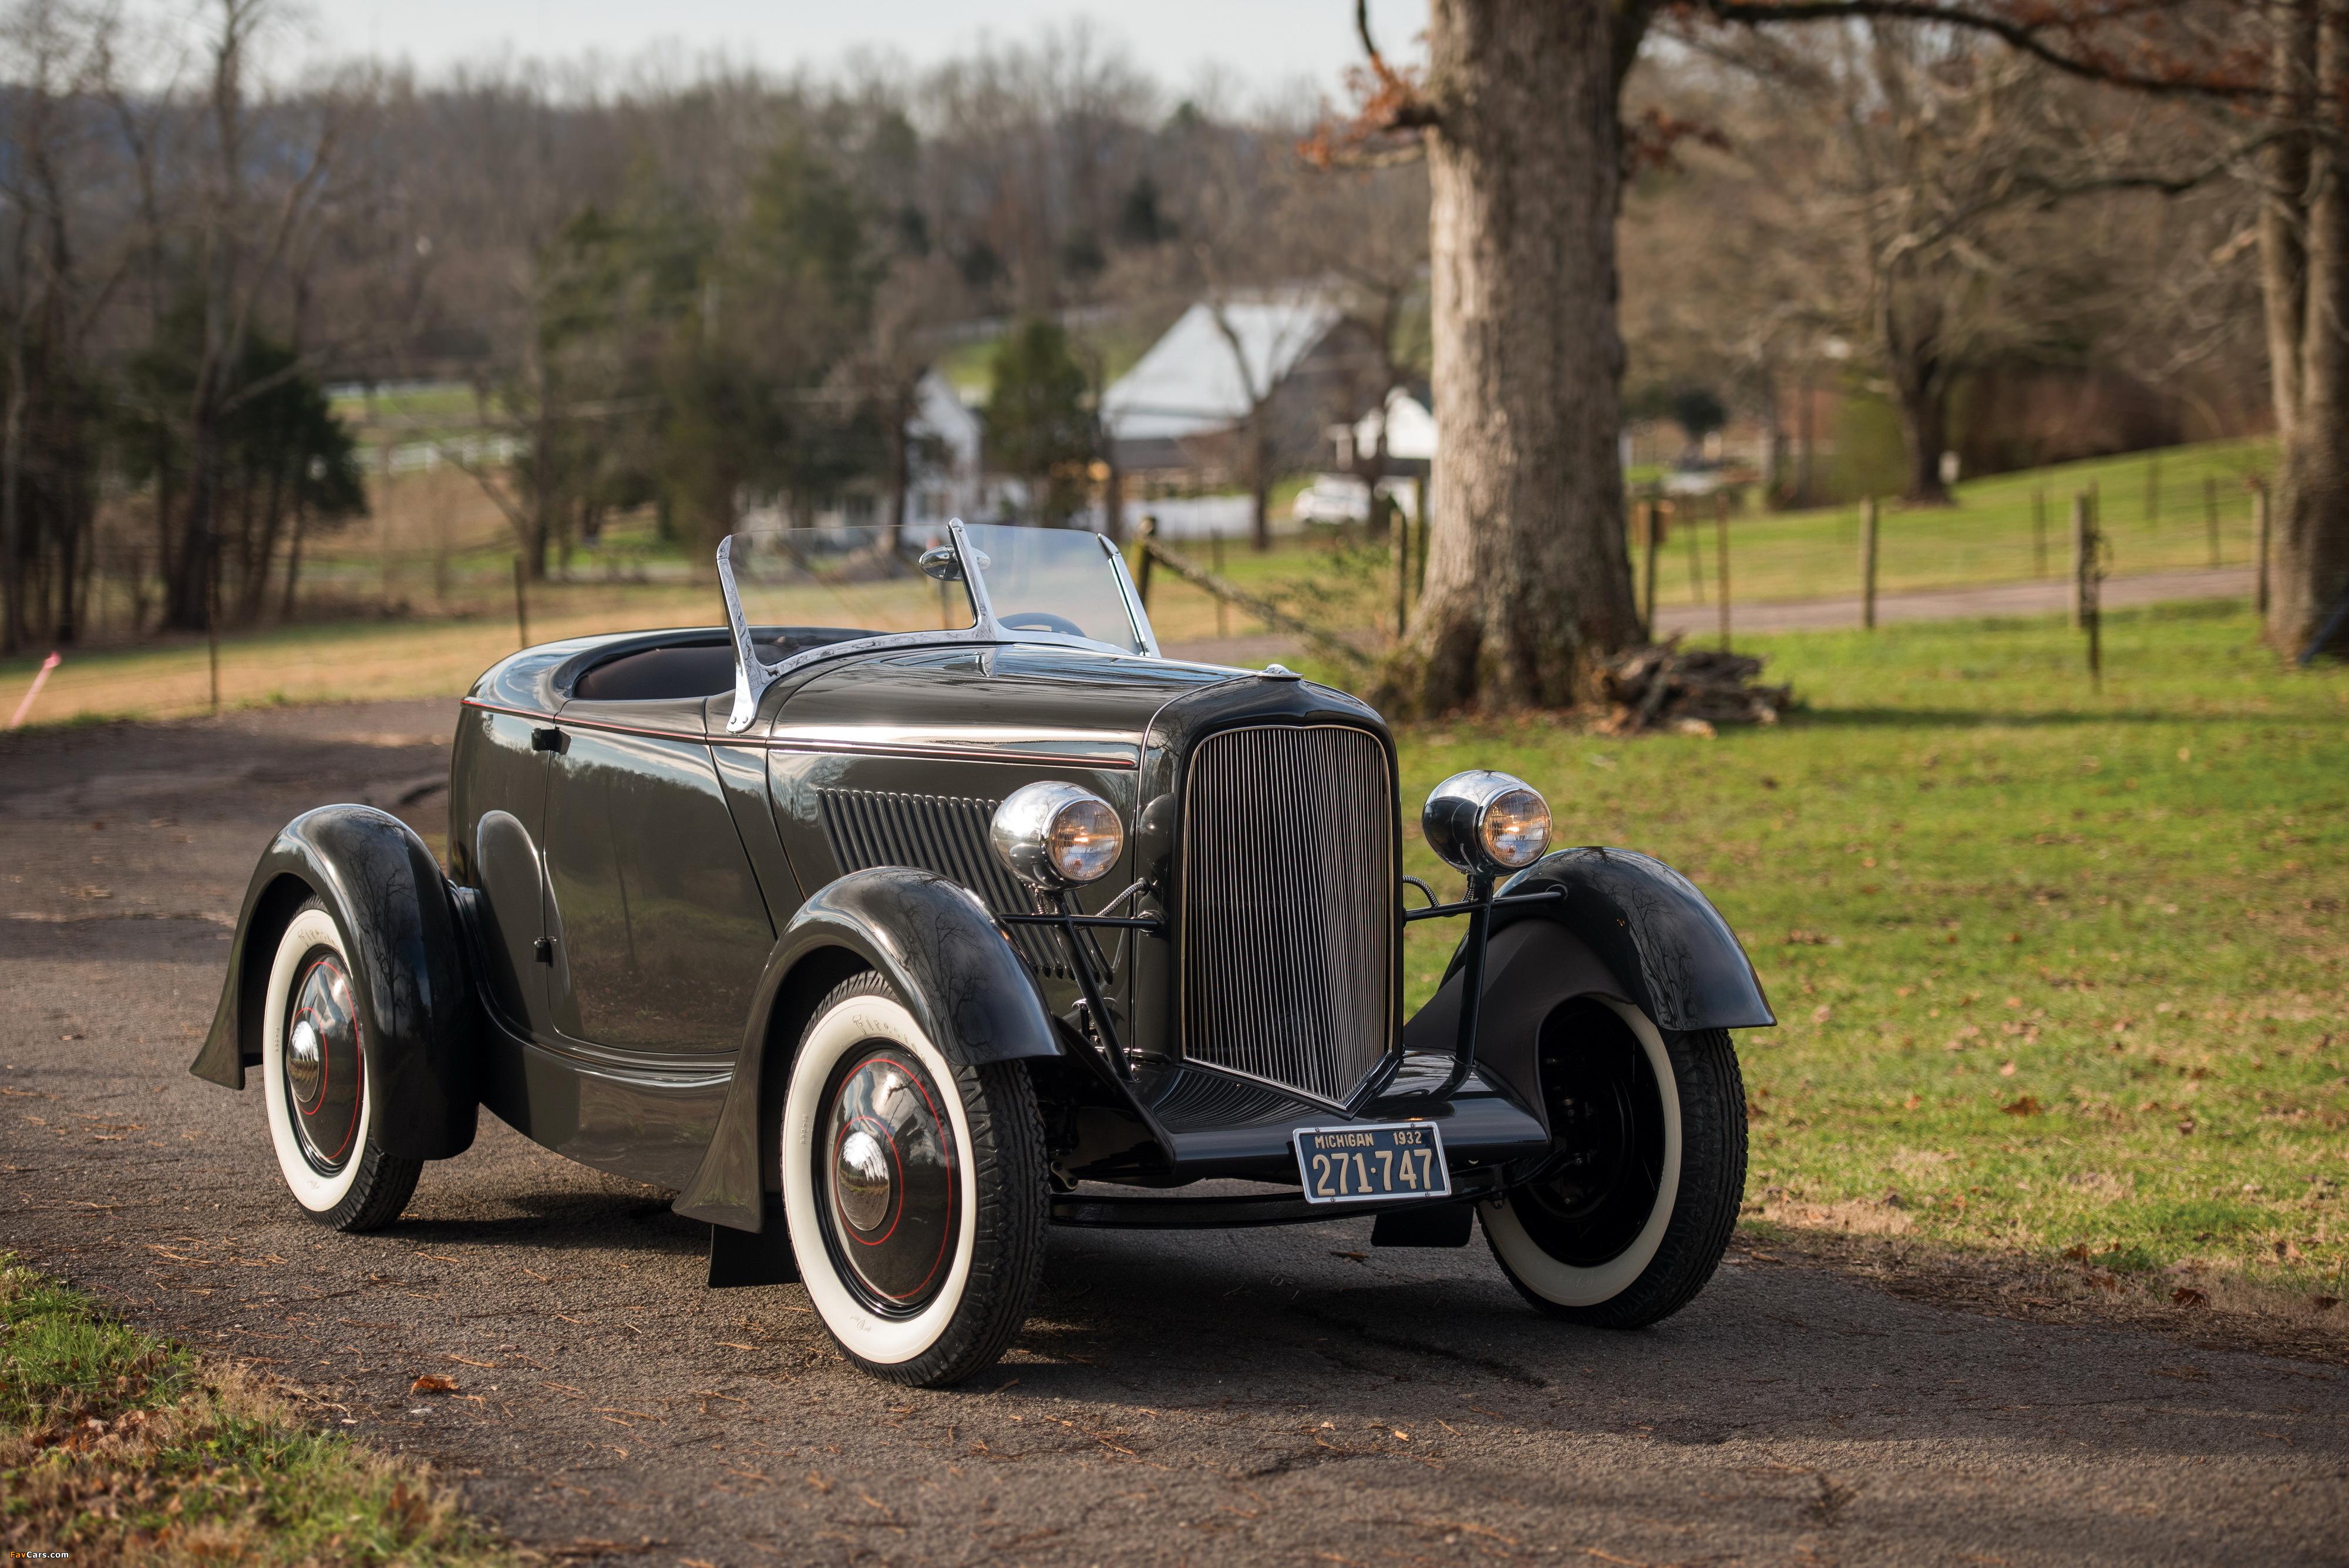 Ford V8 Special Speedster 1932 wallpapers (4000 x 2670)